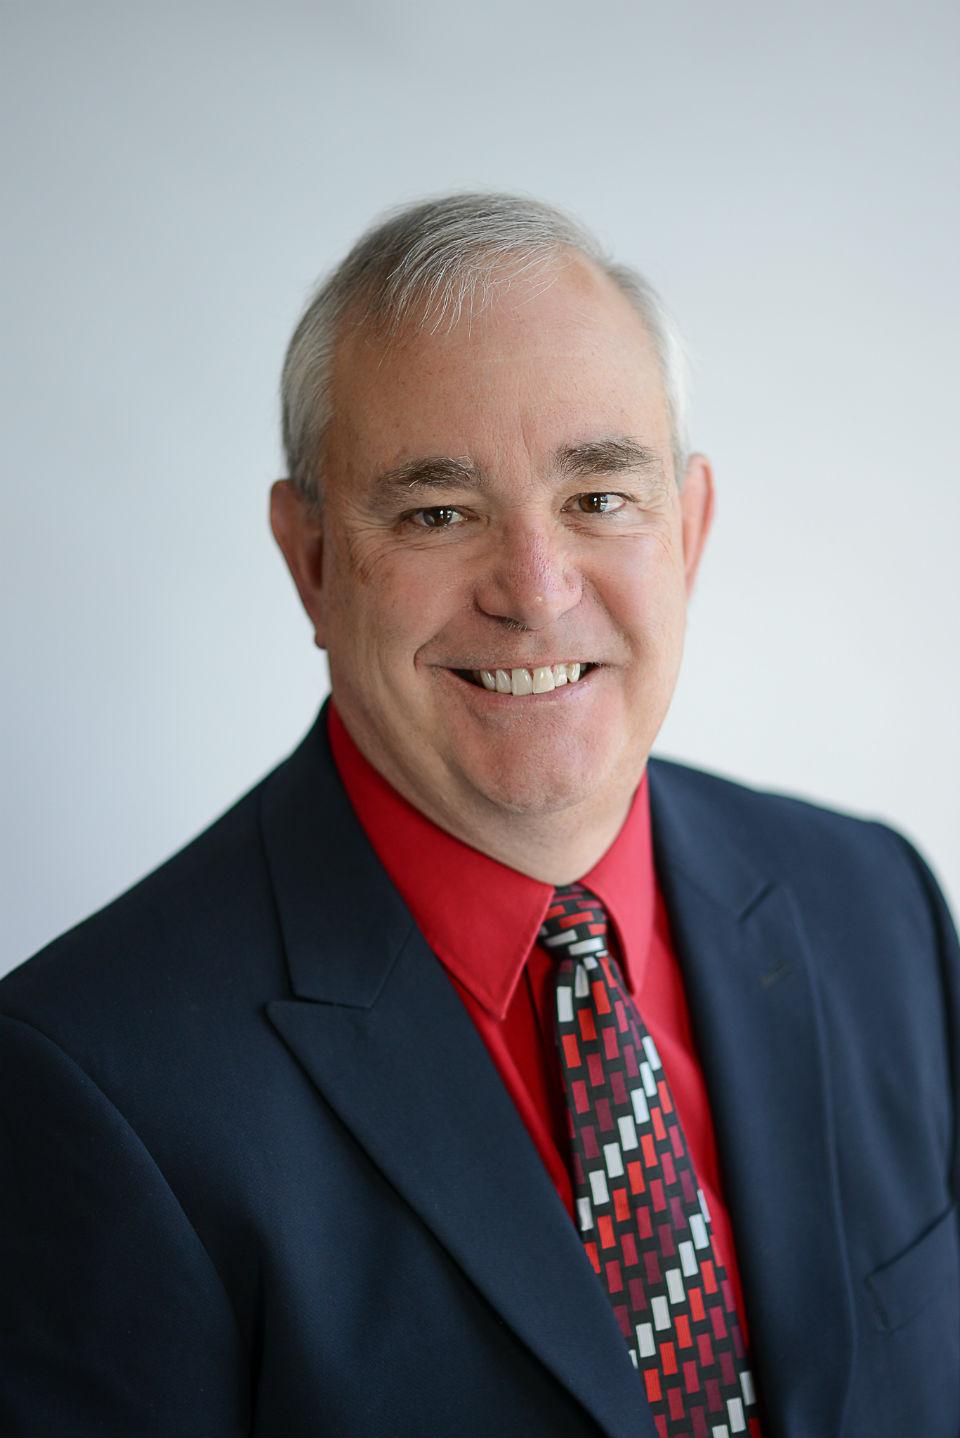 Craig Kuske